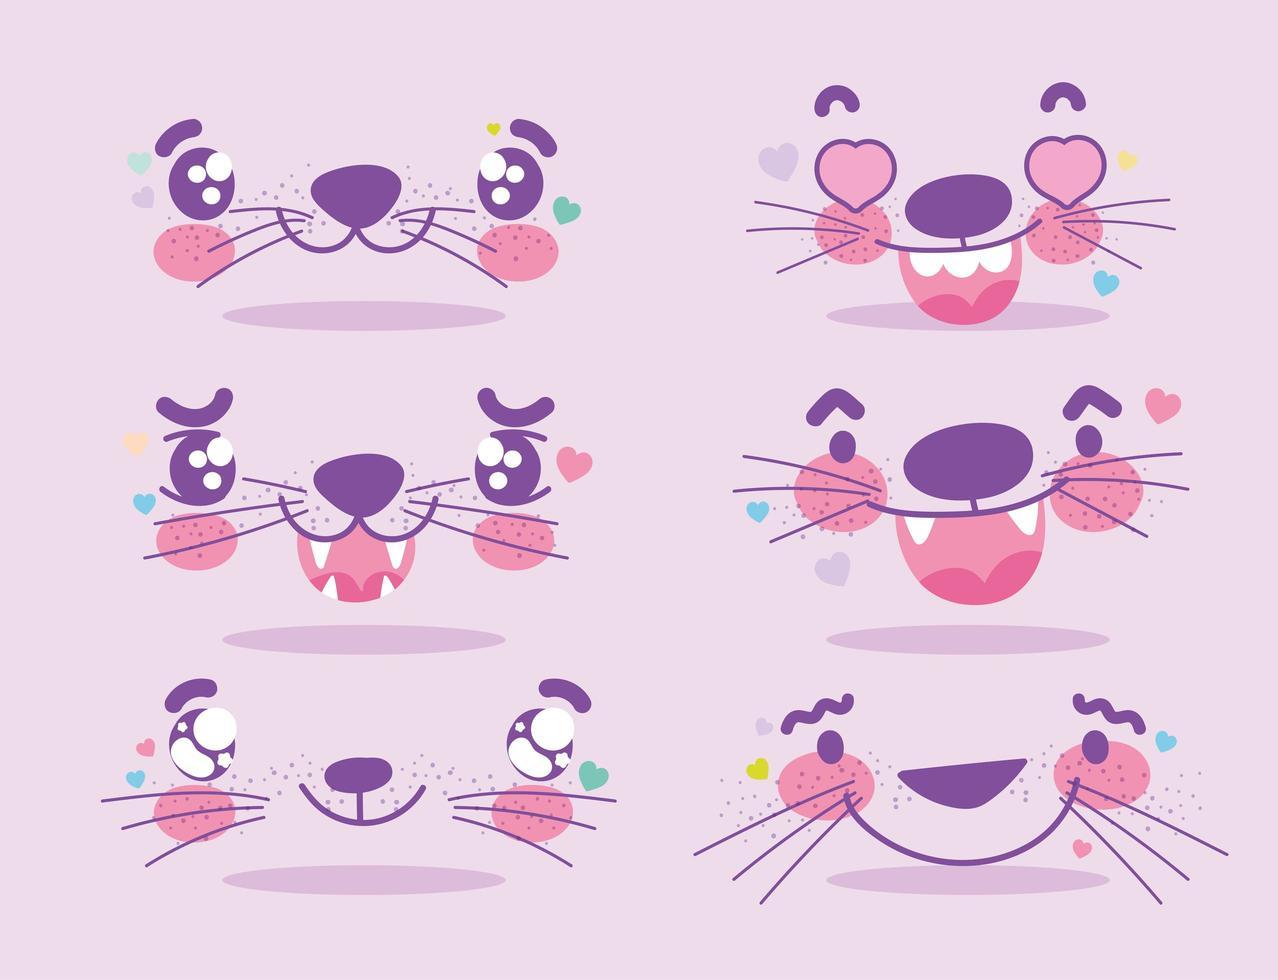 kawaii animaux mignons expressions faciales ensemble emoji vecteur